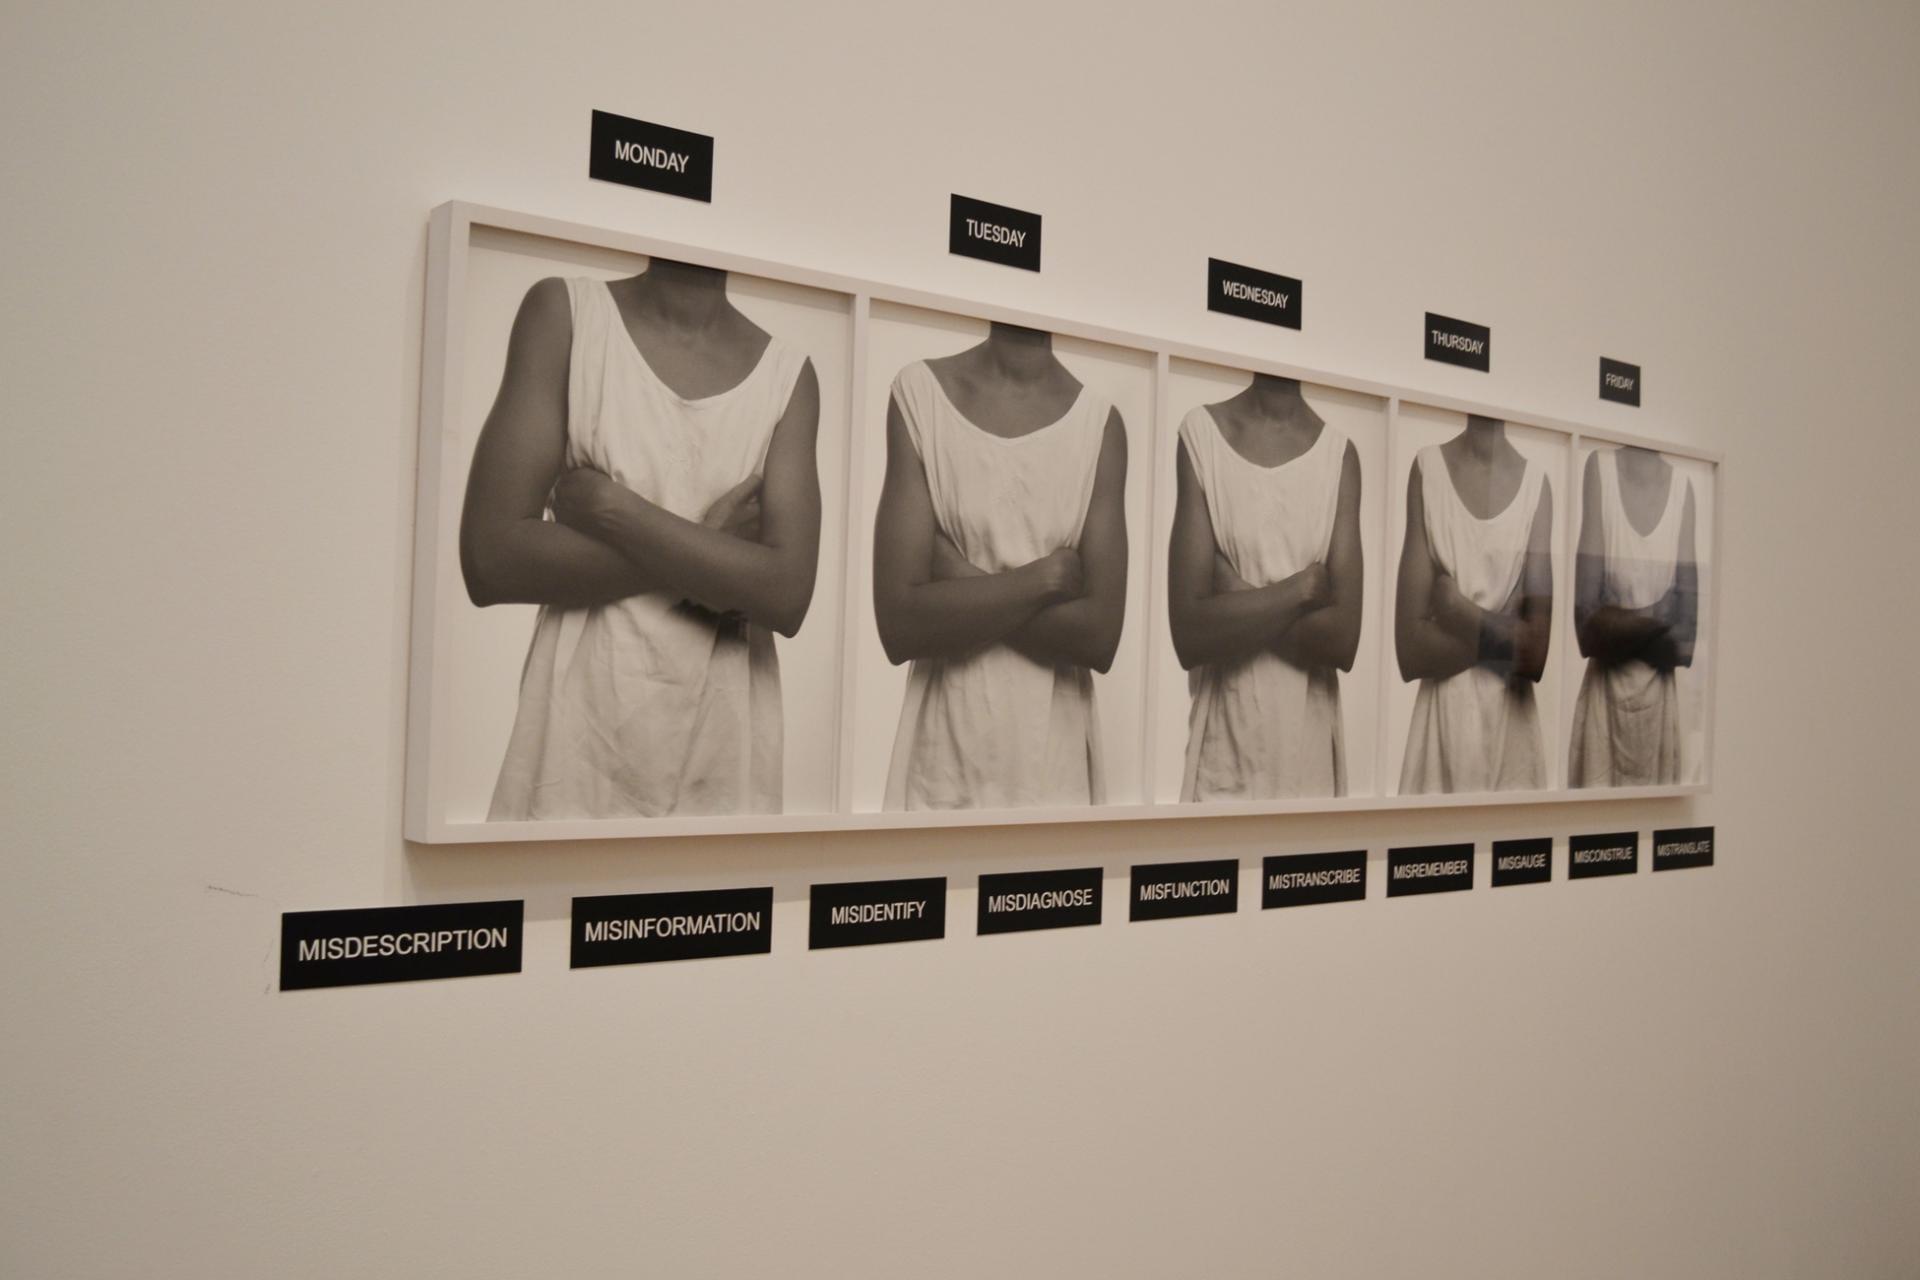 Tate Modern Londres: arte con mensaje